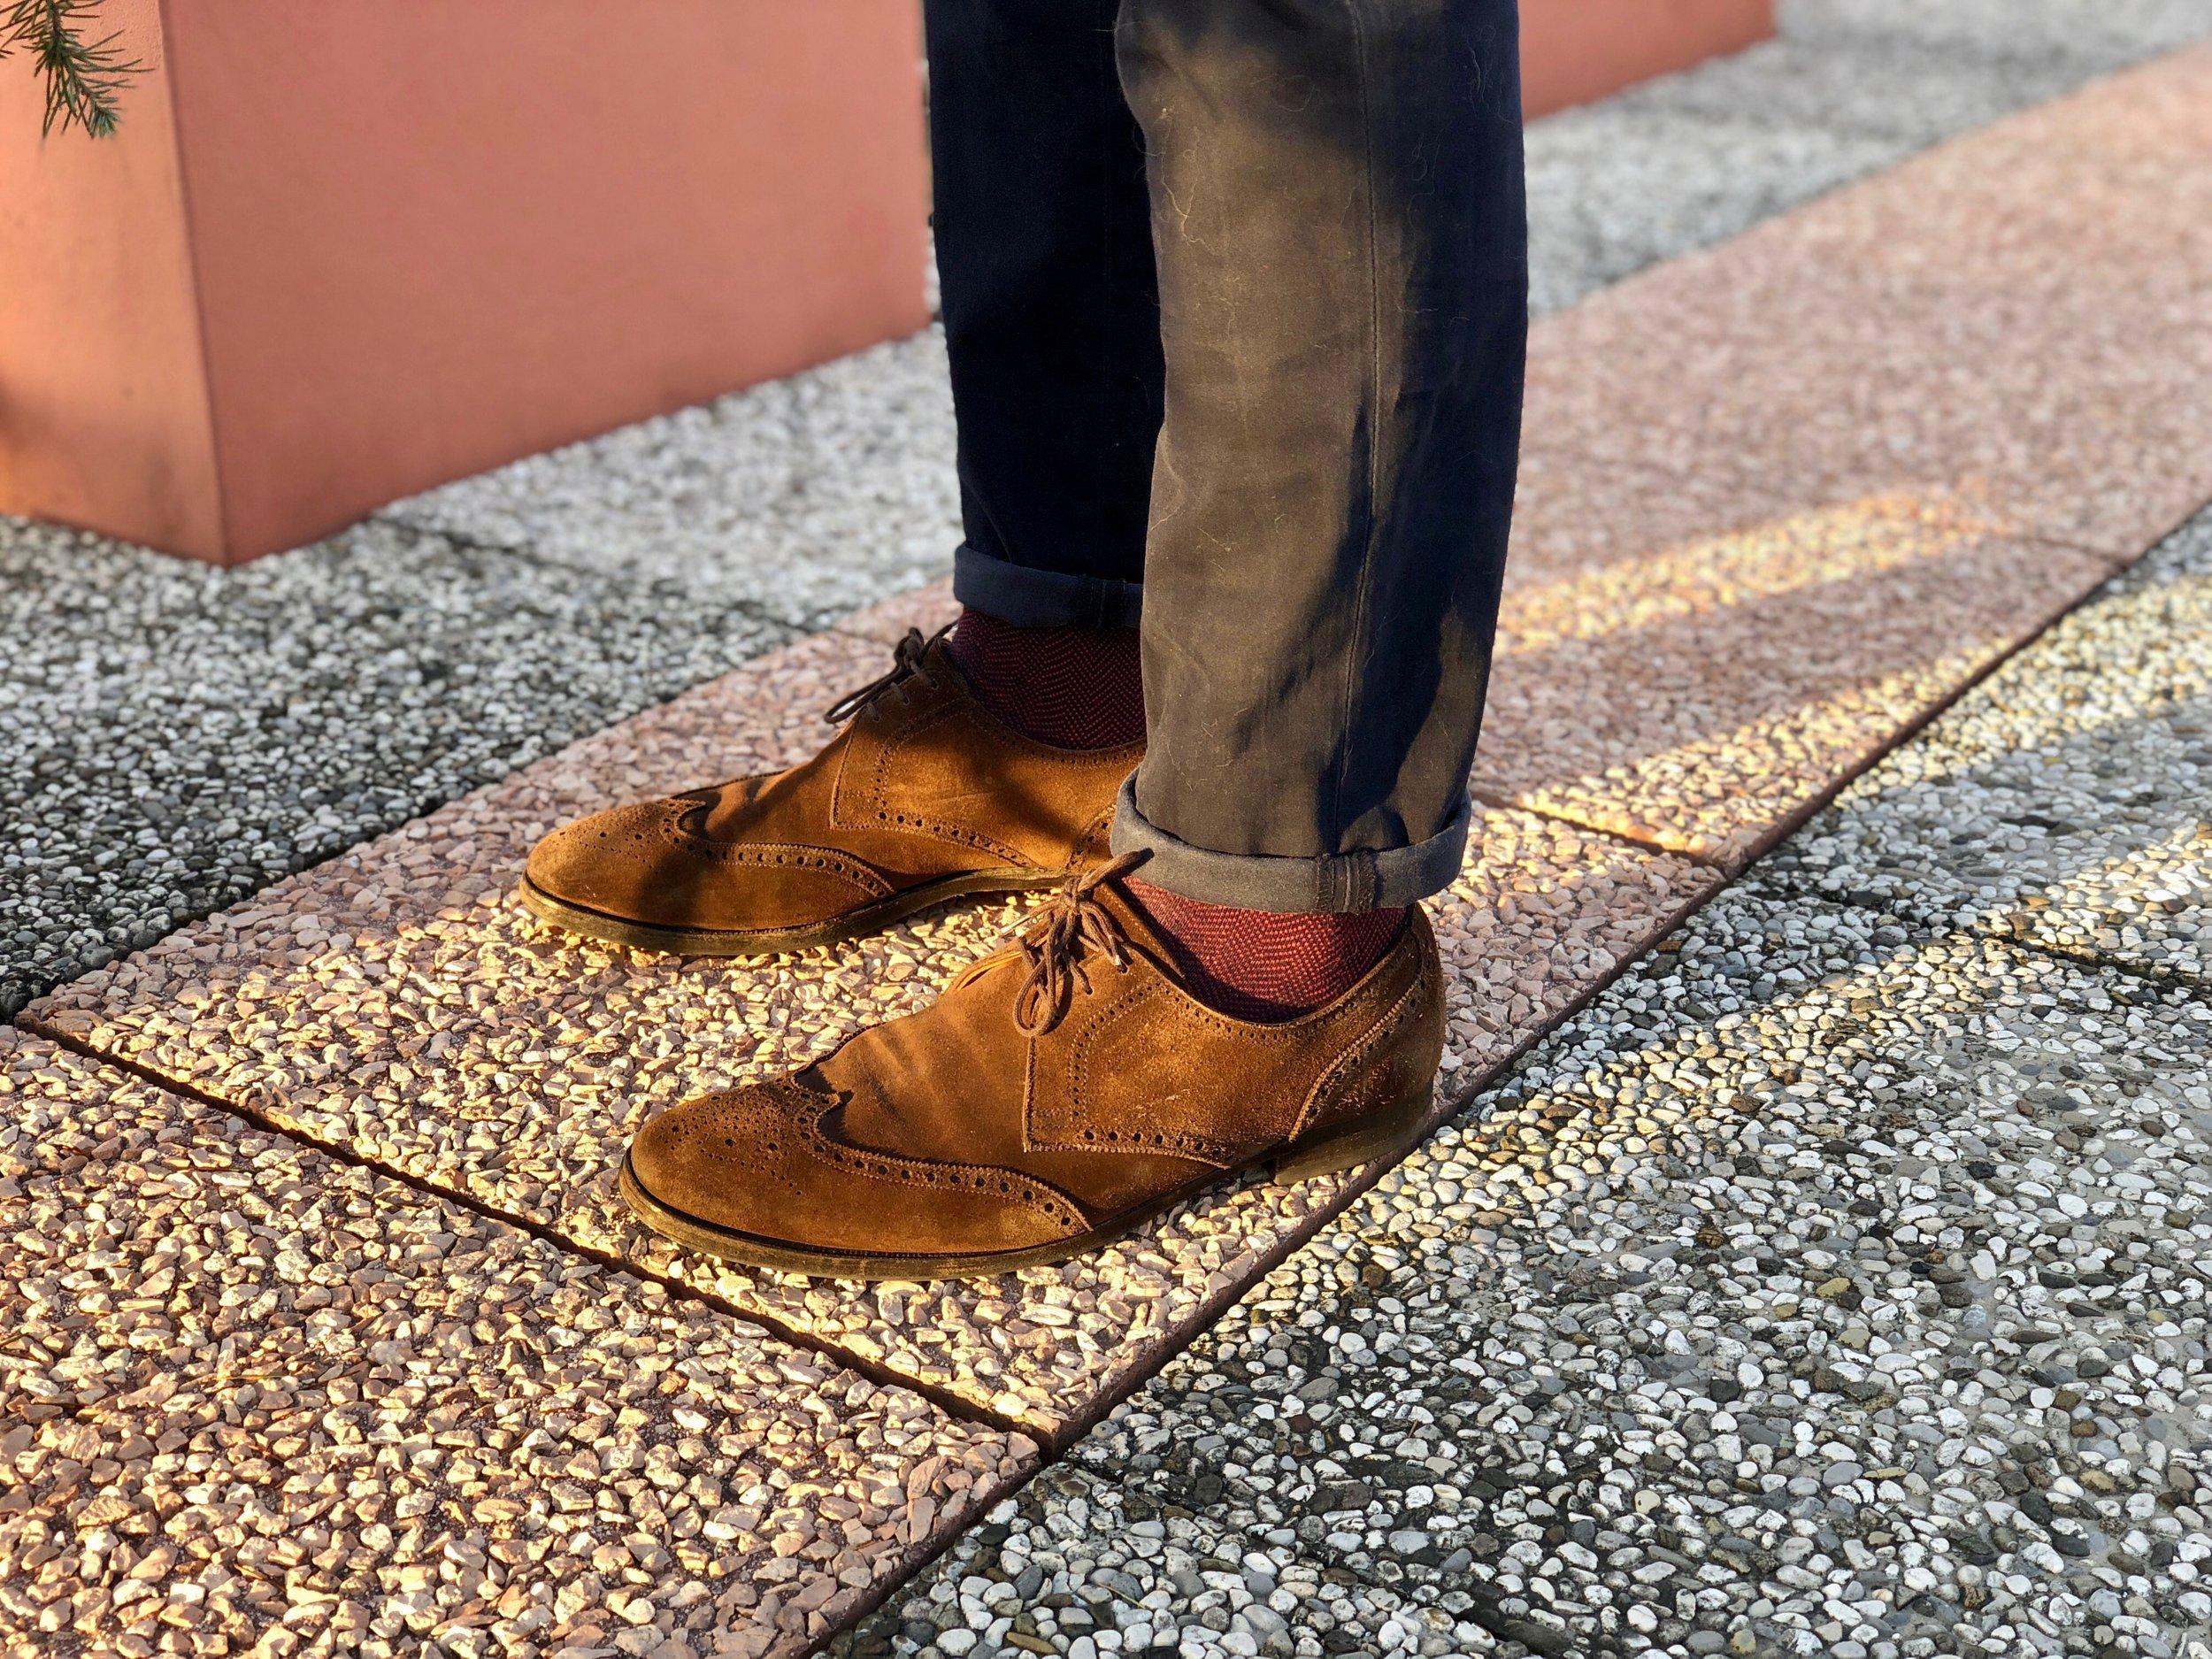 Dondup  chinos,  Alto Milano  socks, seasoned  Ralph Lauren  suede oxford wingtip shoes.  Photo credit: @LucaMontini